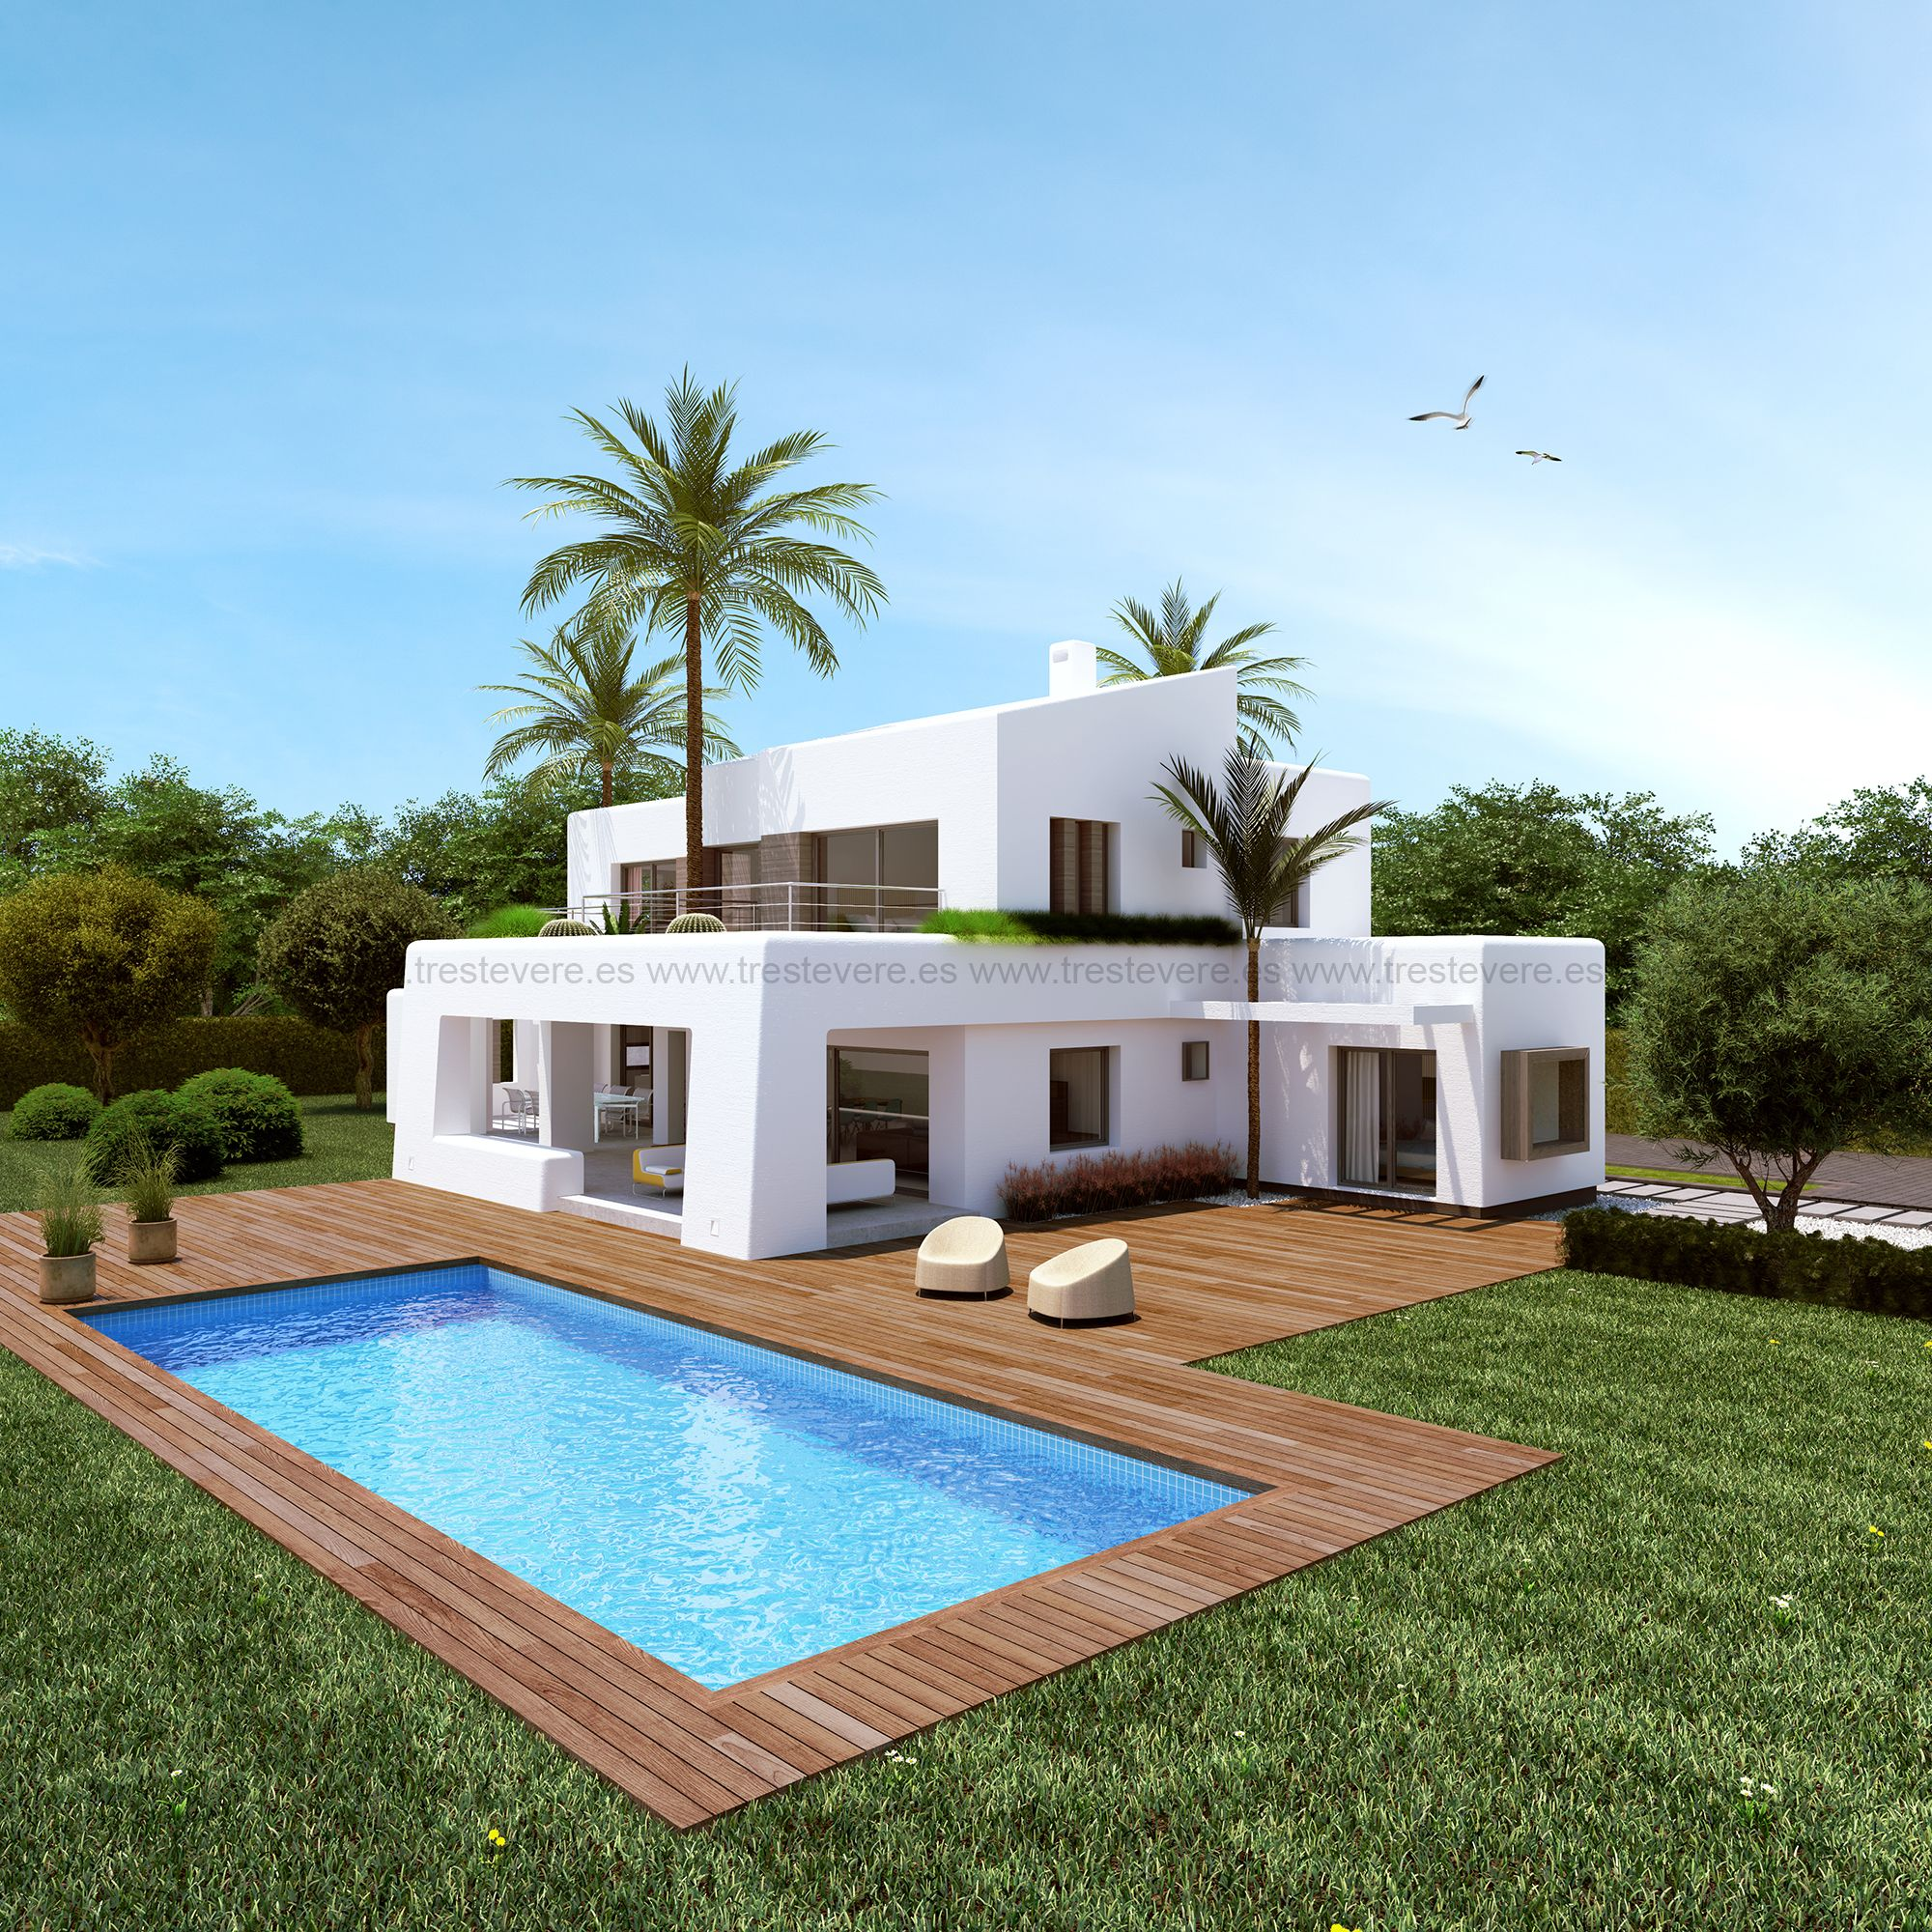 Vivienda moderna 01 casas verano pinterest viviendas for Fachadas de casas bonitas y economicas